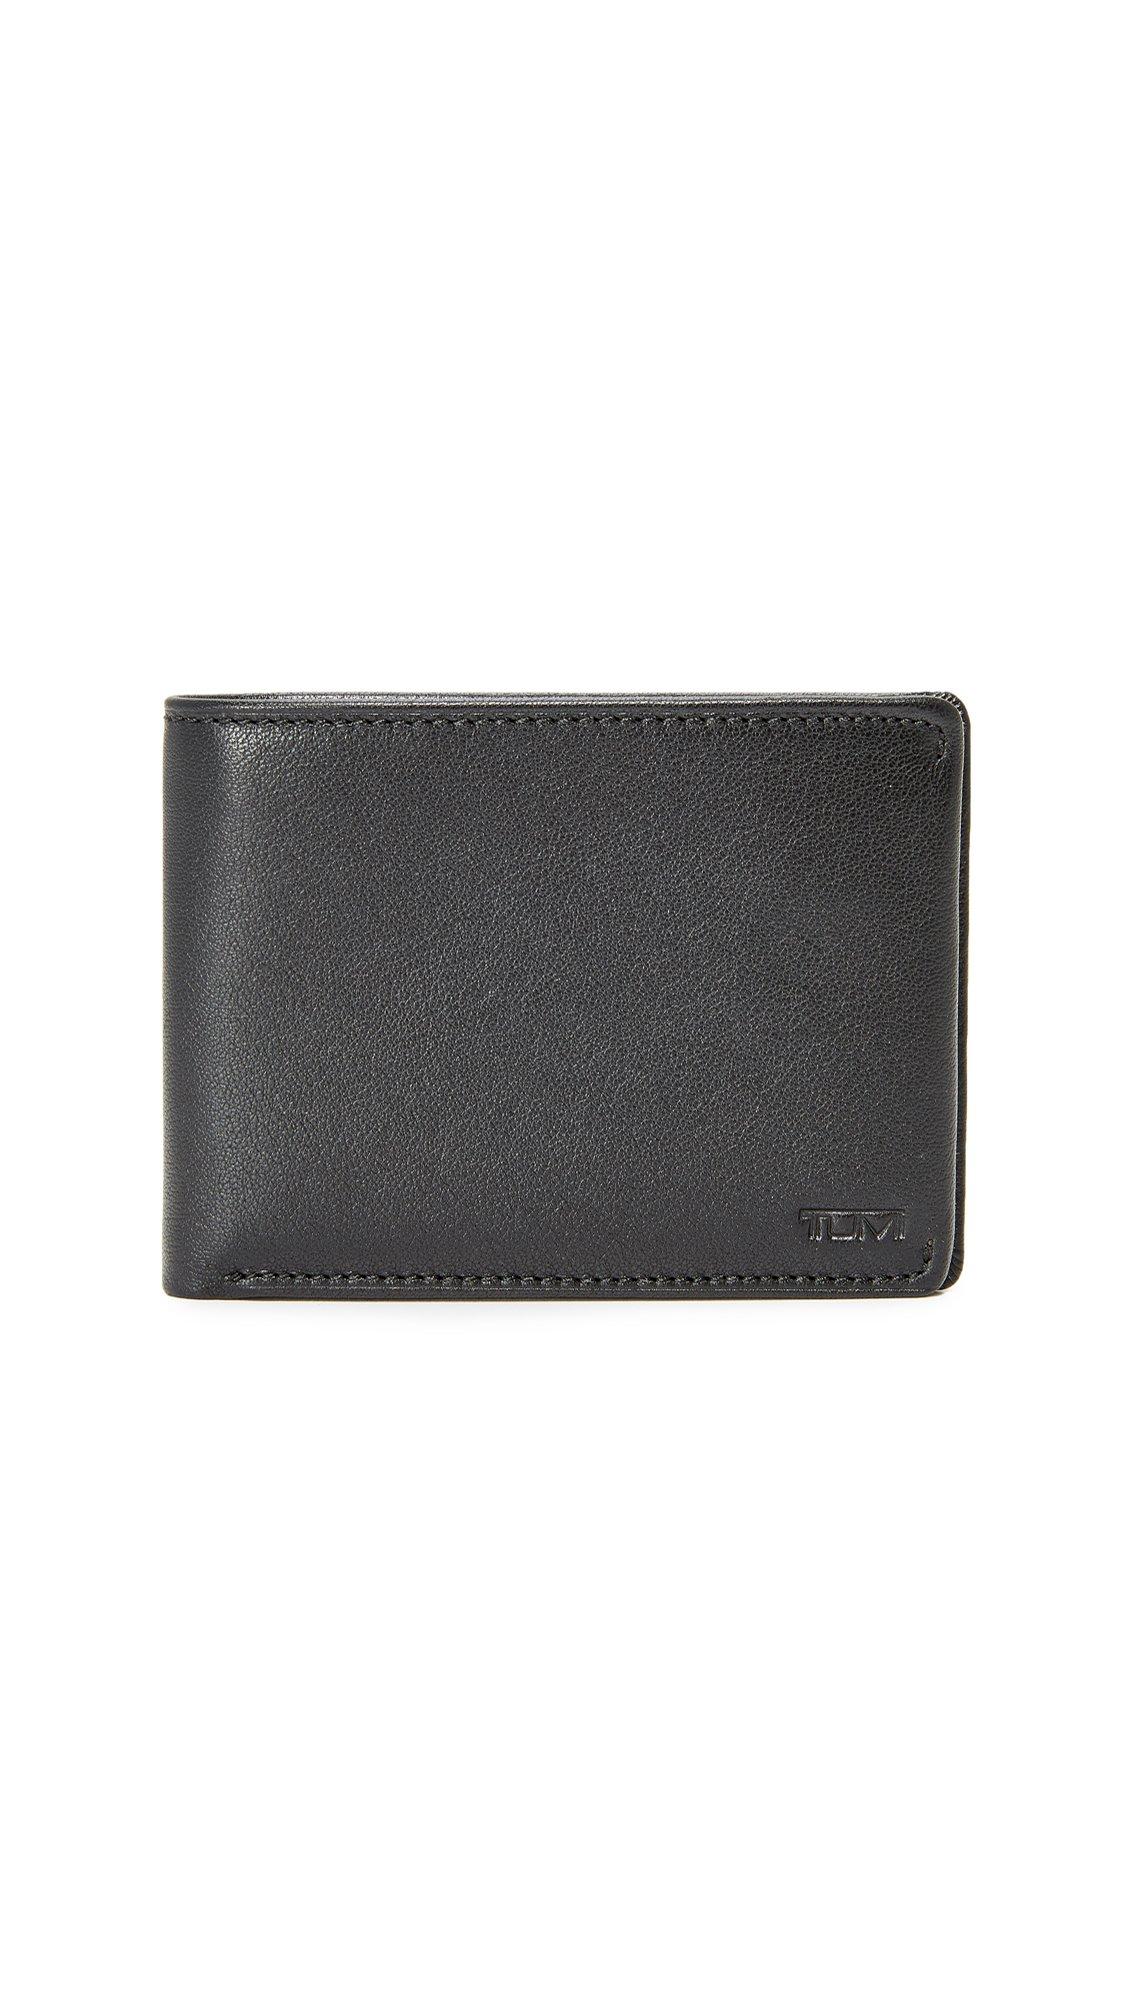 TUMI Men's Nassau Double Billfold Wallet Accessory, -black texture, One Size